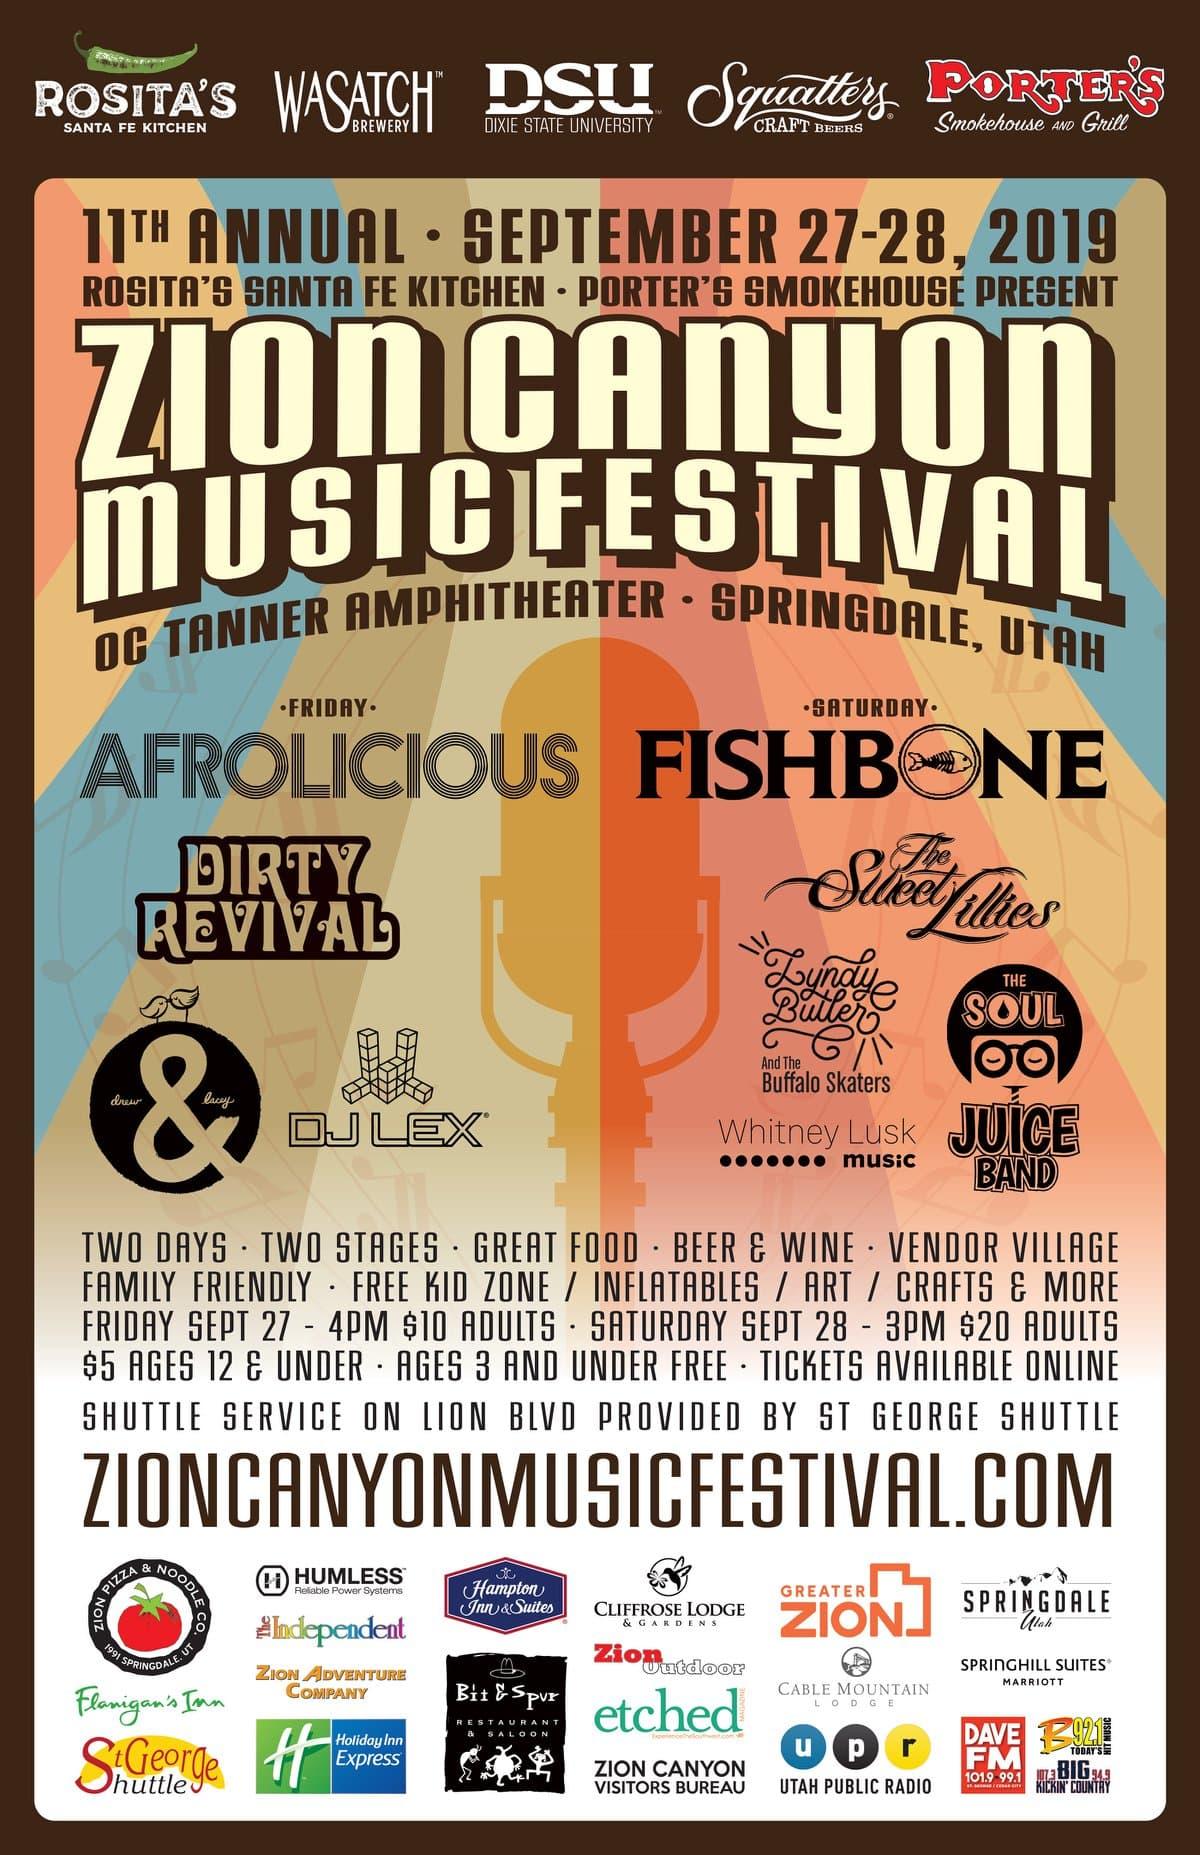 Festival | The Soul Juice Band